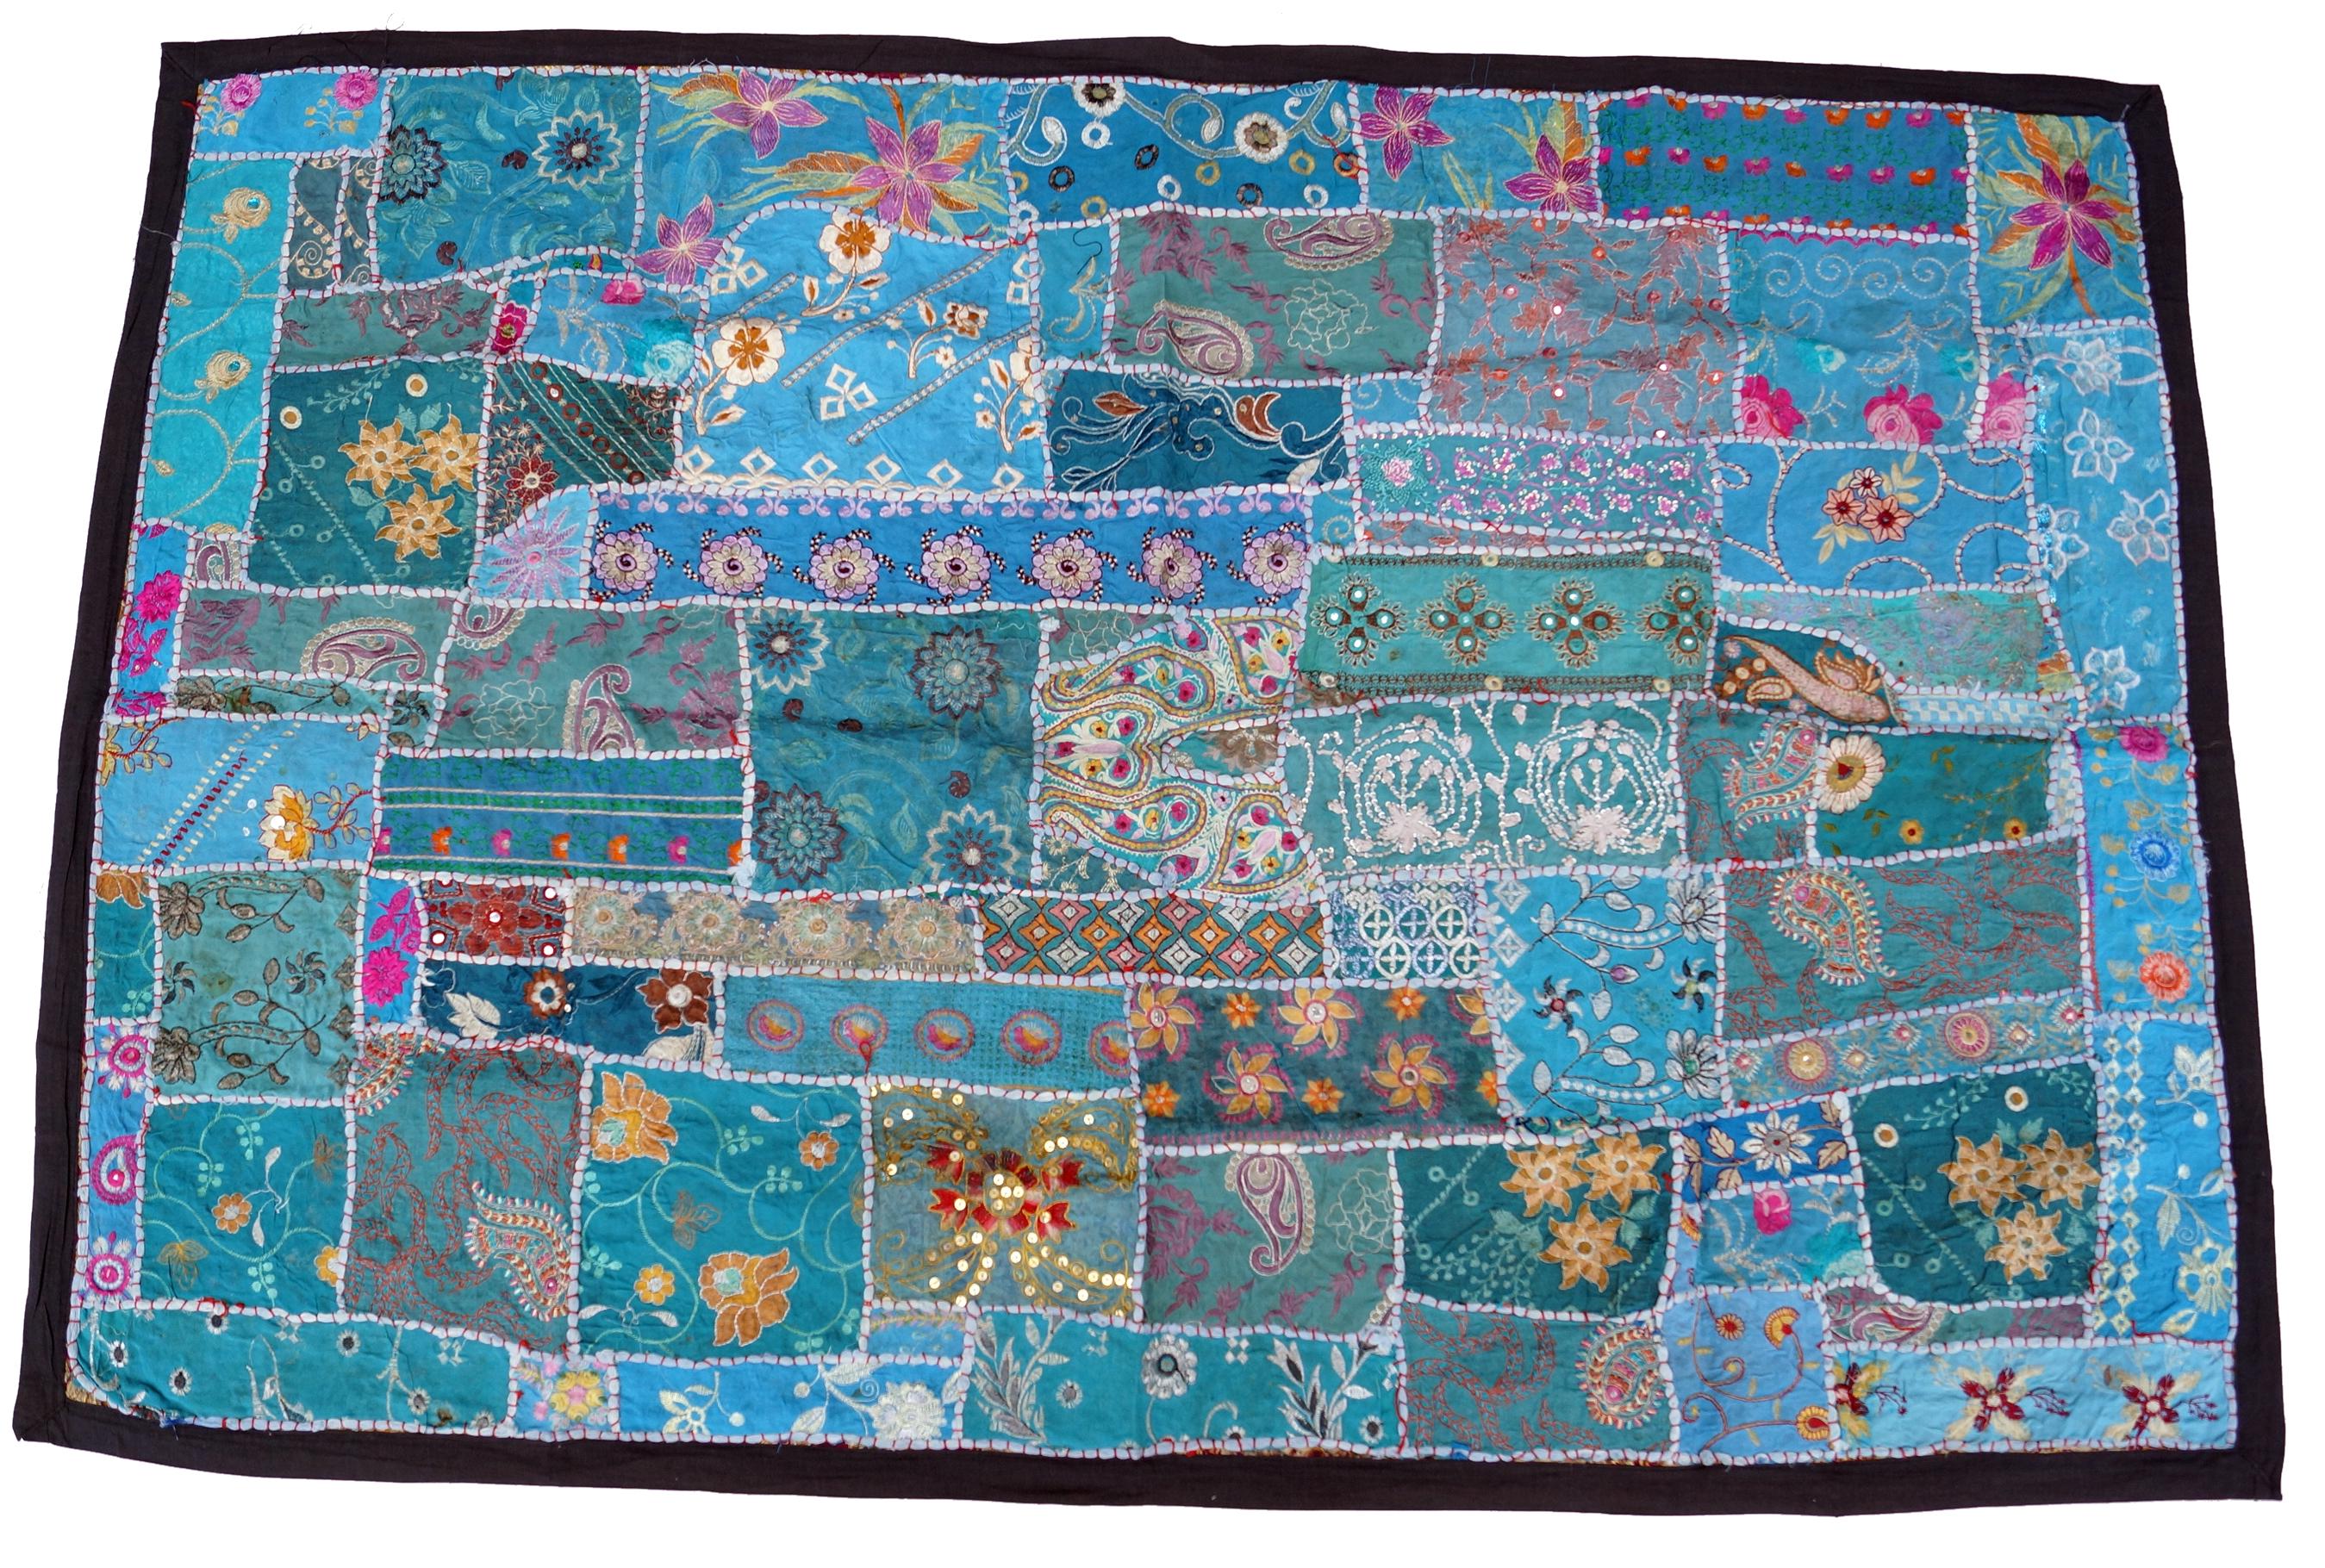 indischer wandteppich patchwork wandbehang 2 2 110 155 0 5 cm ebay. Black Bedroom Furniture Sets. Home Design Ideas